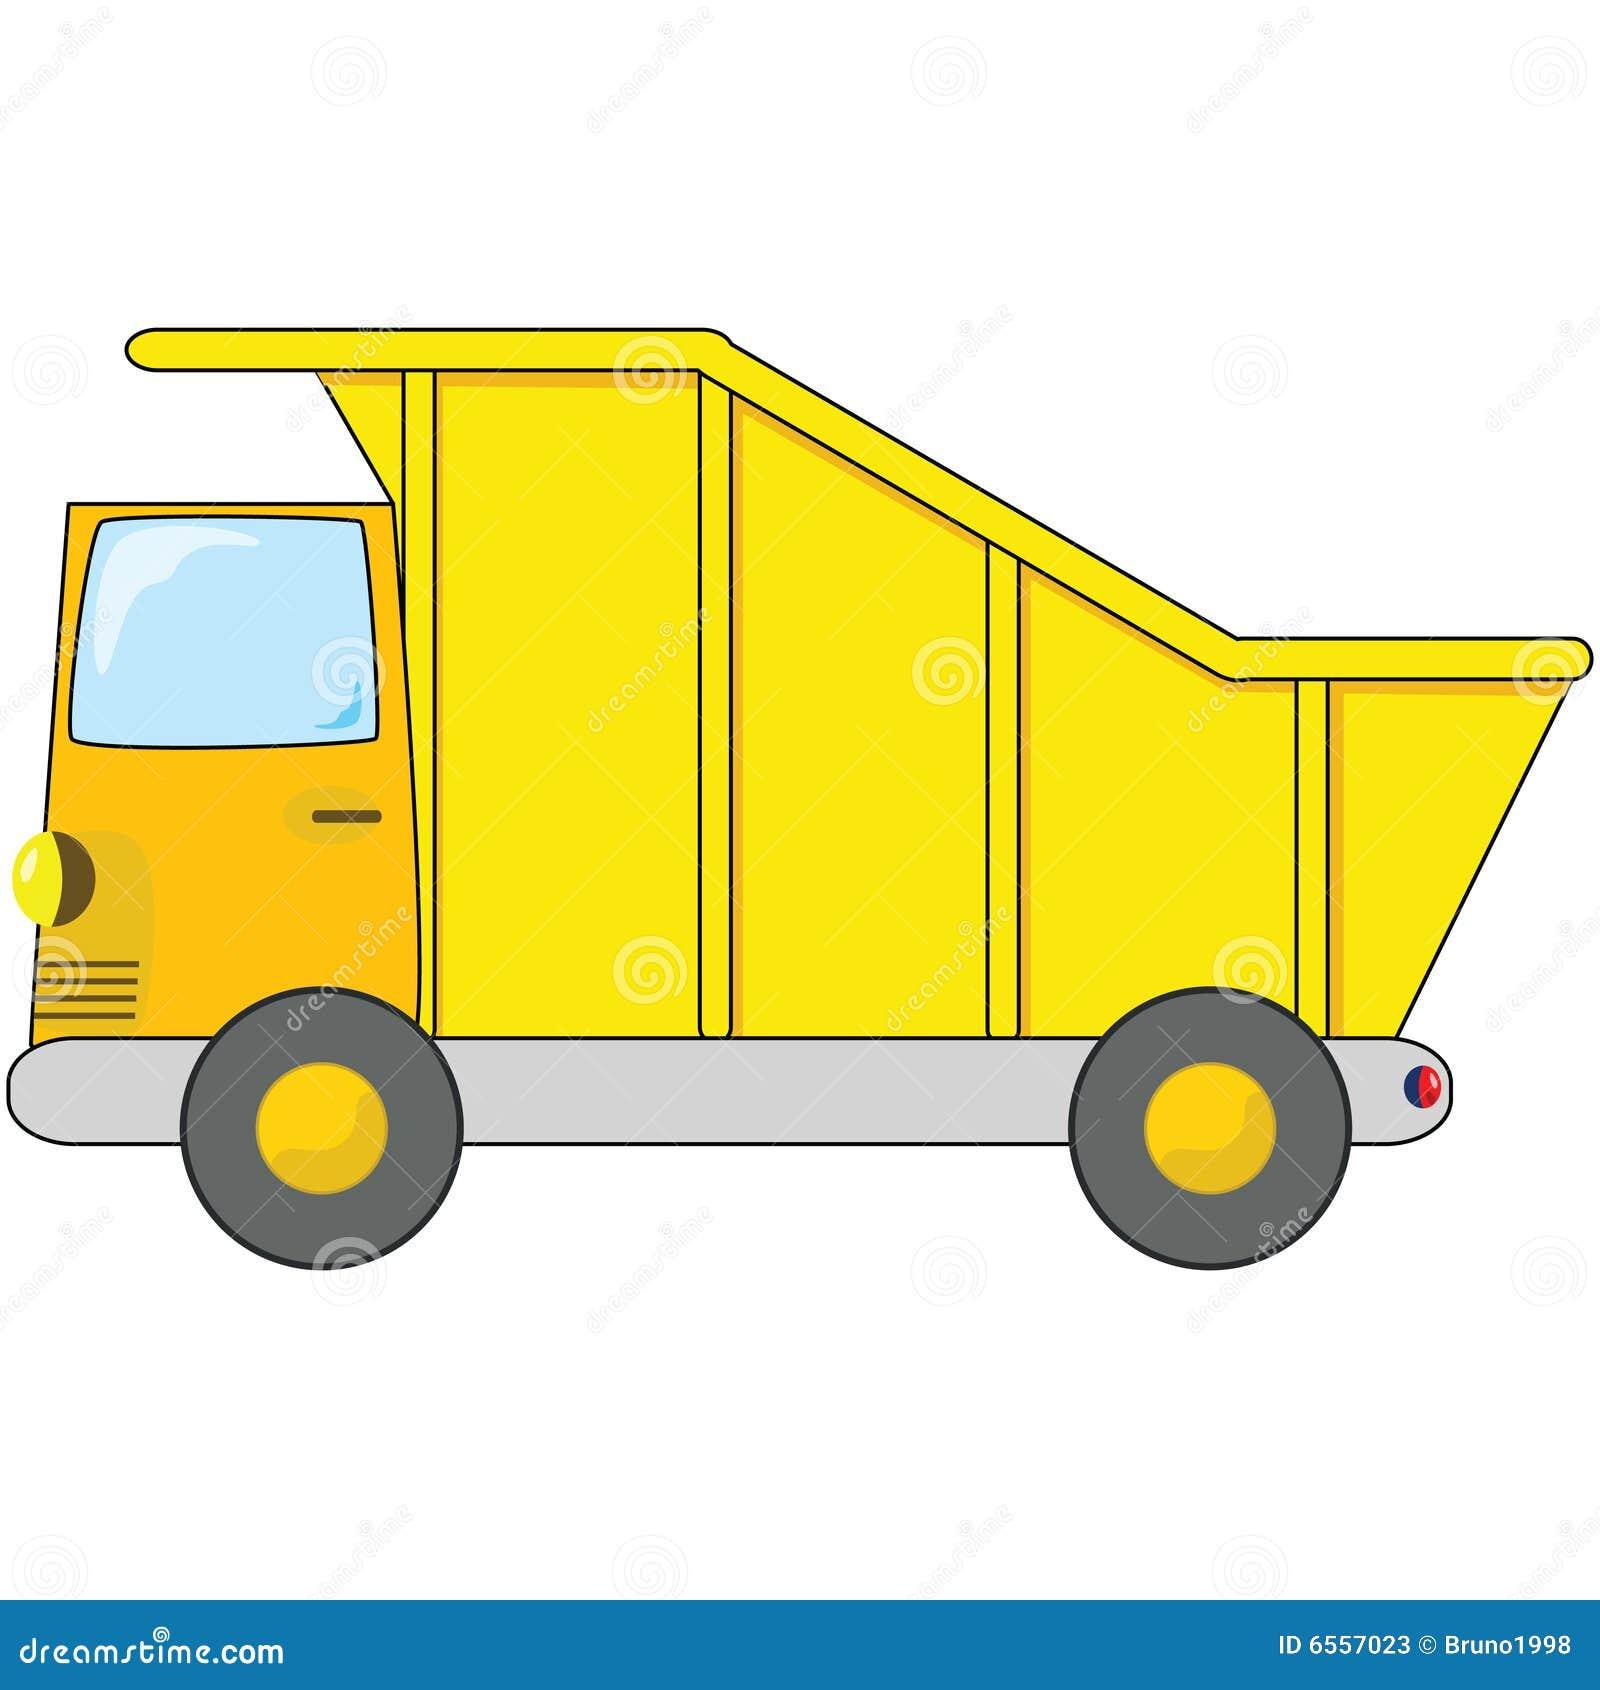 Cartoon Dump Truck Stock Vector. Illustration Of Machine